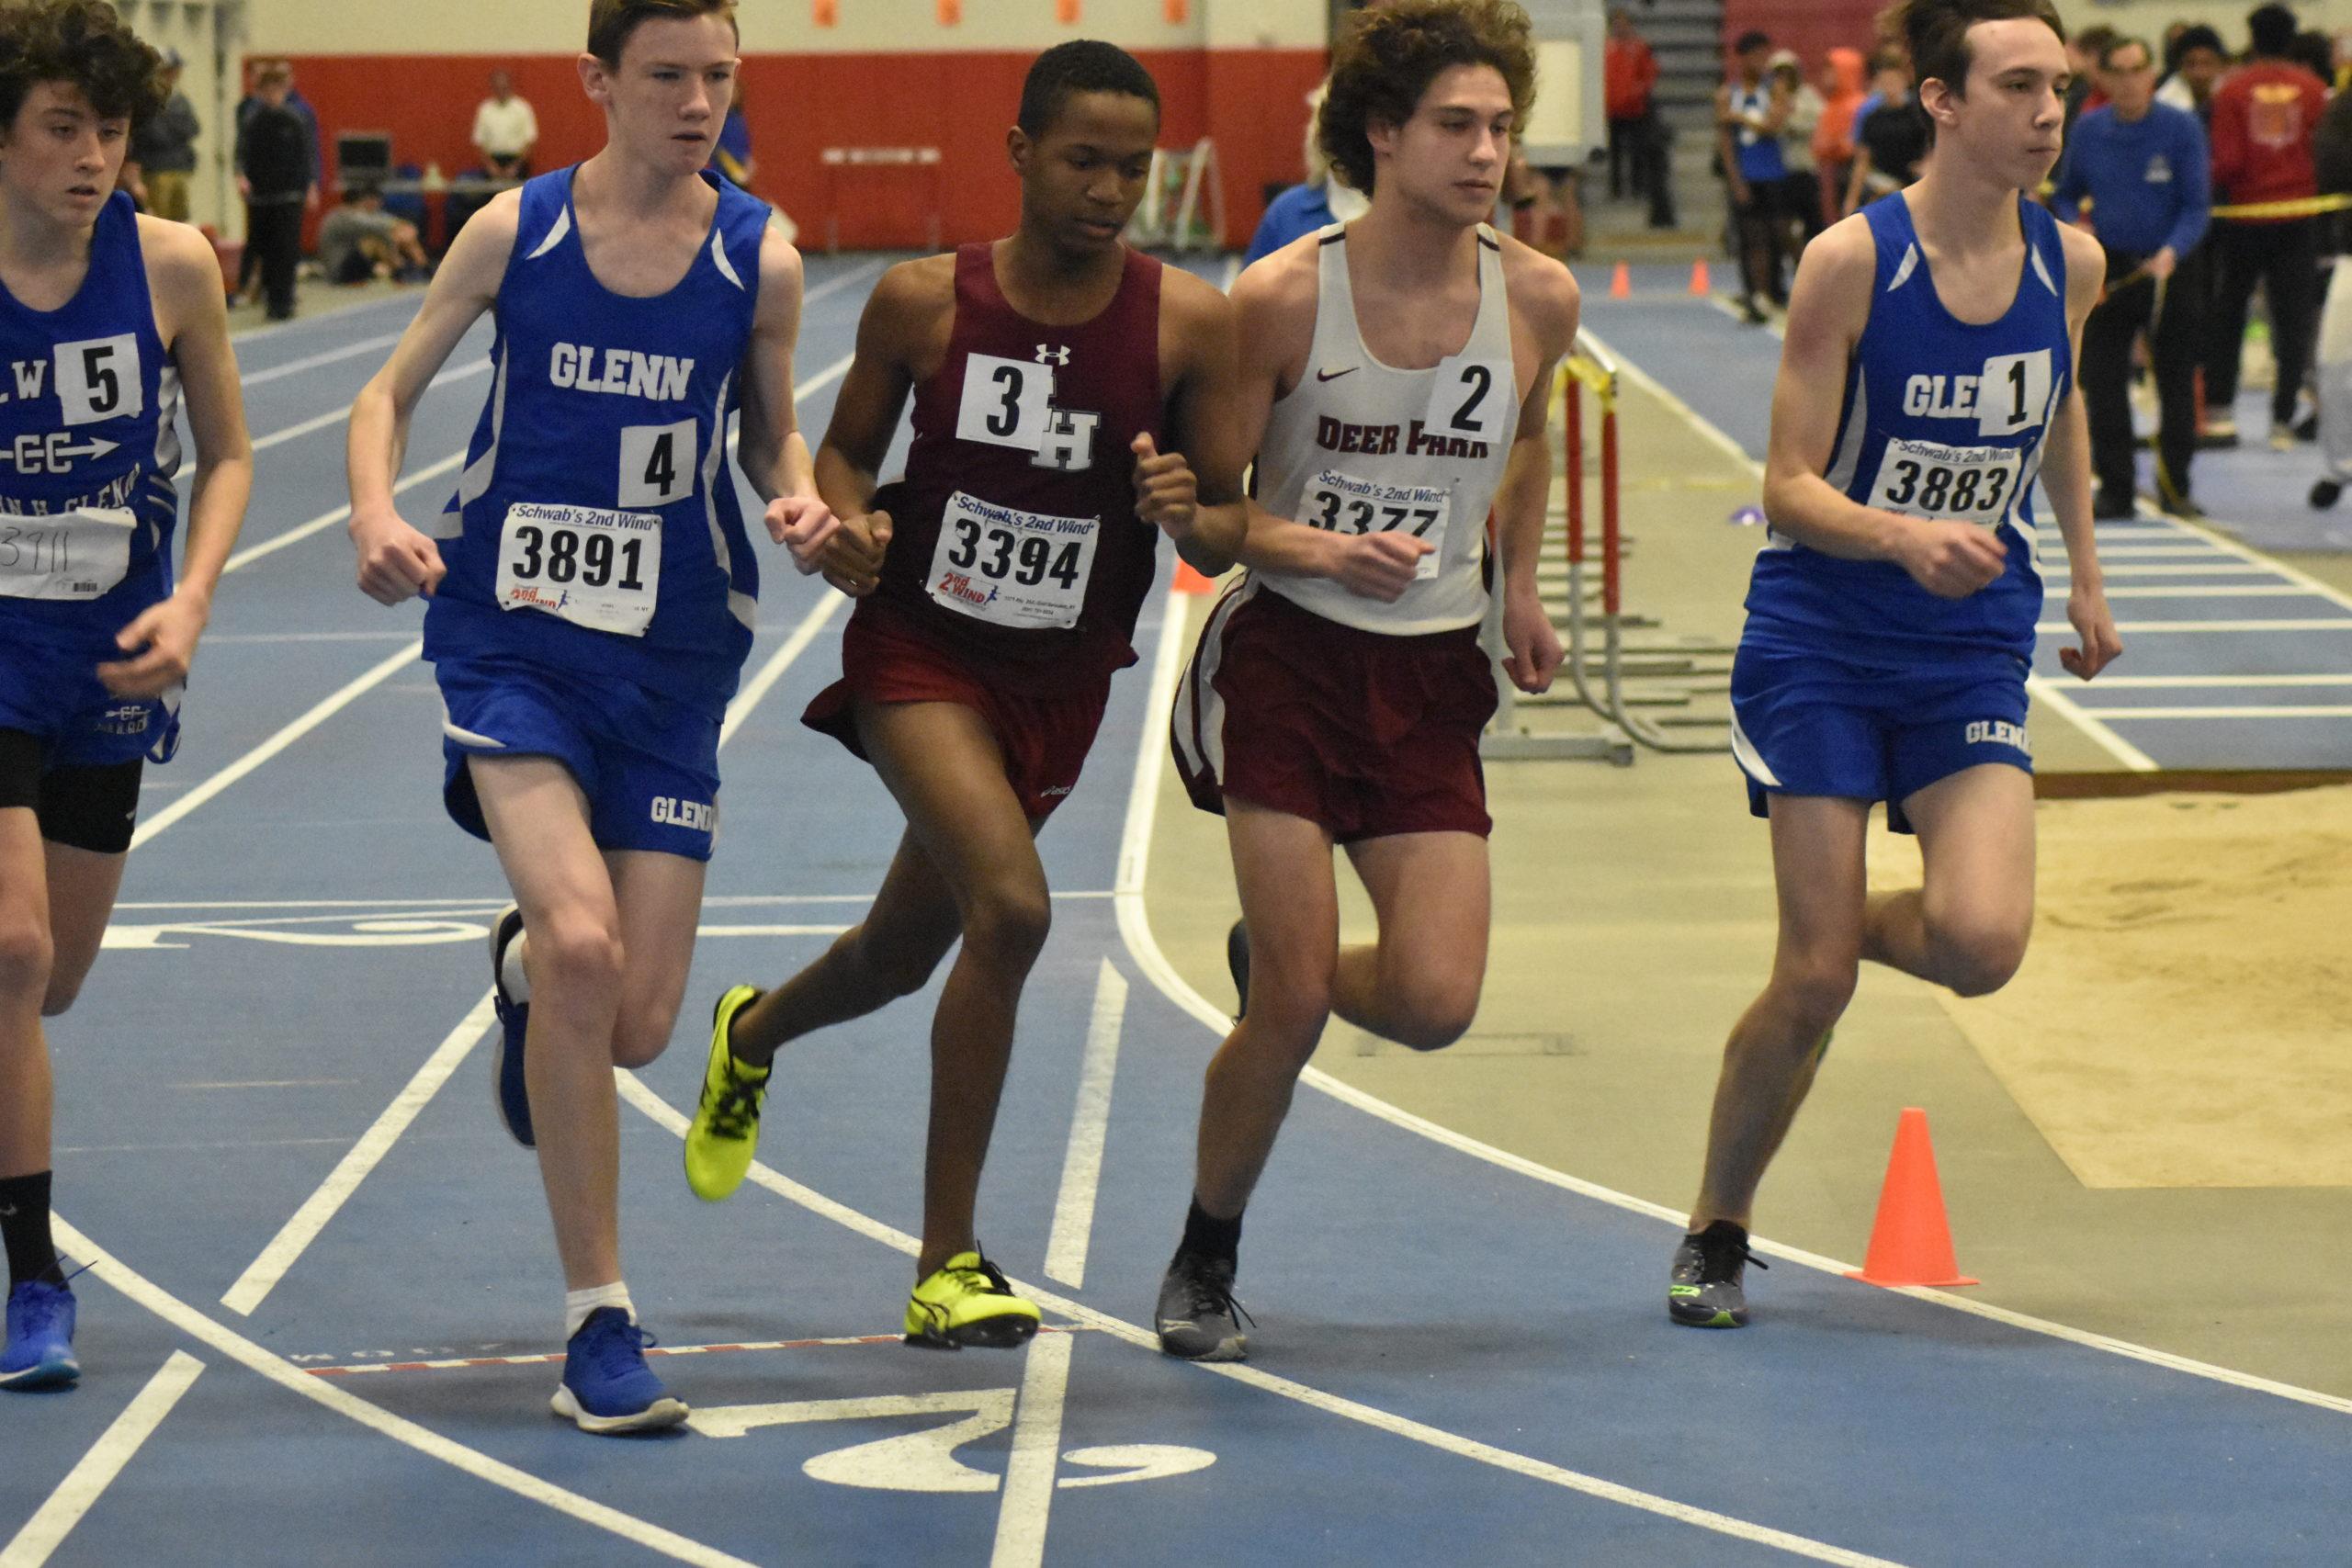 East Hampton's Amari Gordon jockeys for position at the start of the 1,000-meter race.